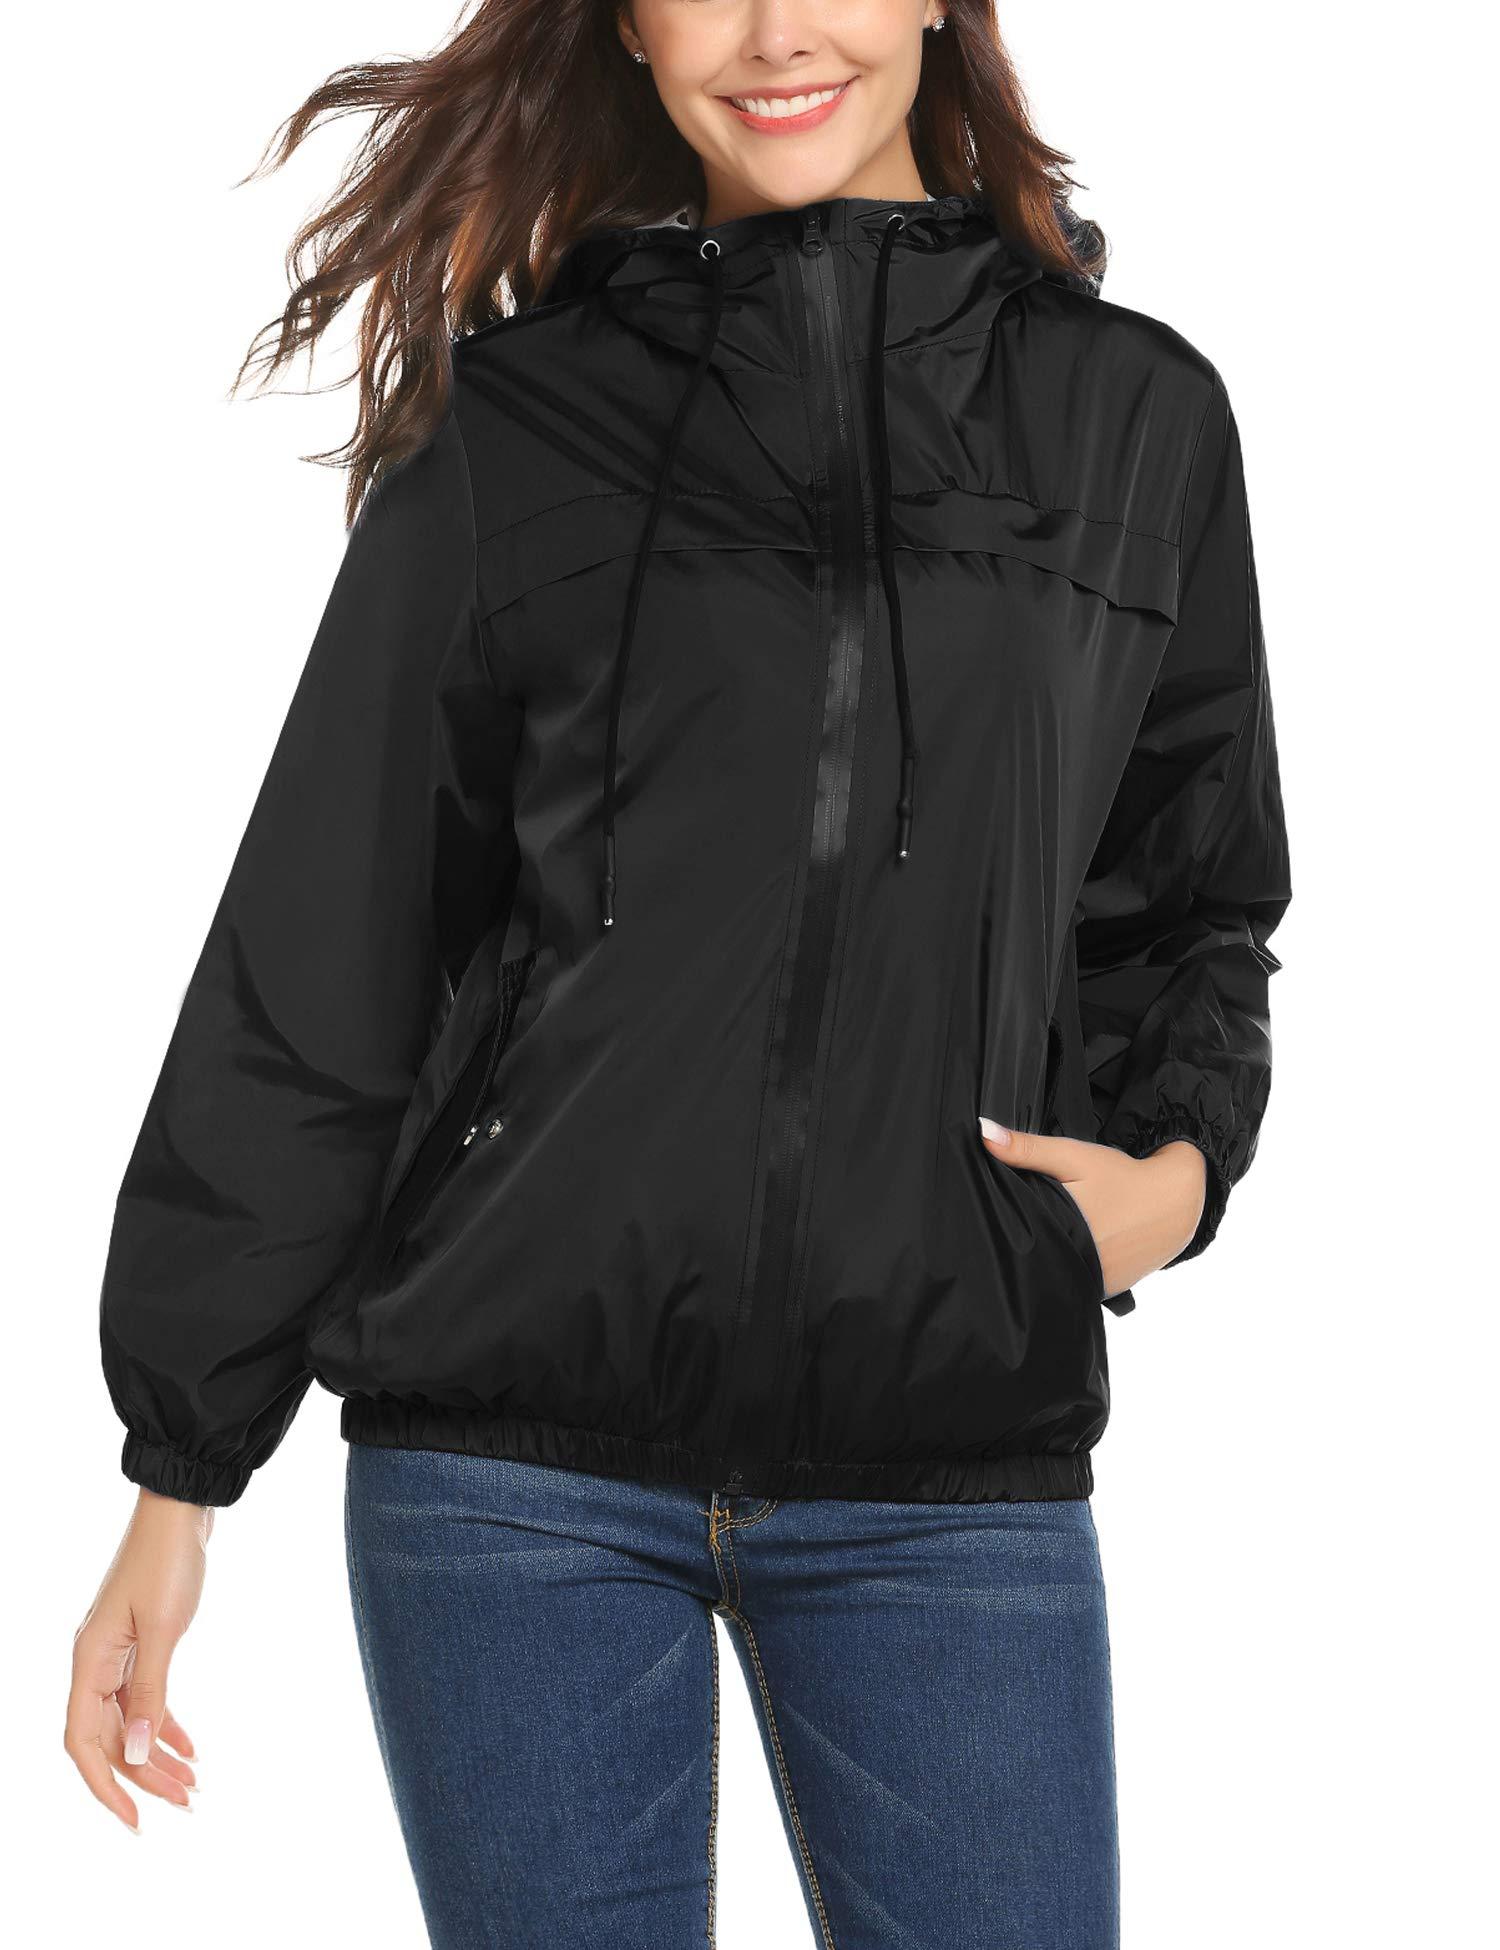 LOMON Womens Rain Jacket Lightweight Waterproof Hooded Raincoat Active Outdoor Windbreaker